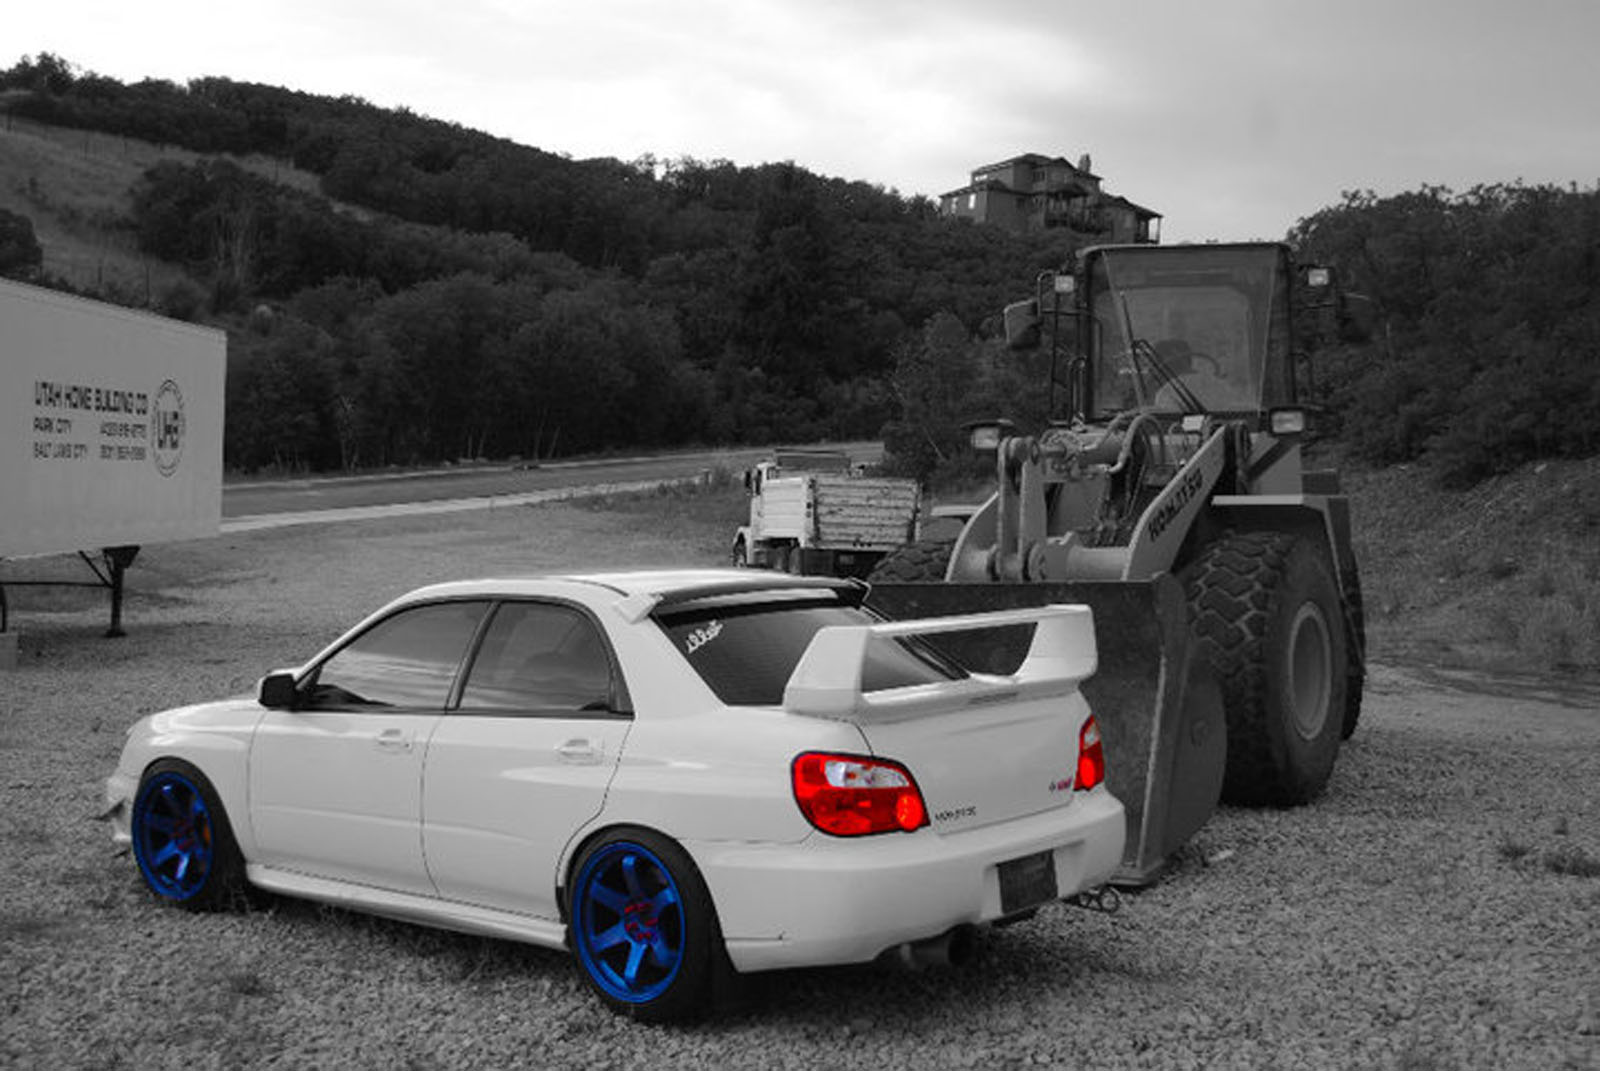 2004 Subaru Wrx Sti Impreza Sti Sti For Sale Utah